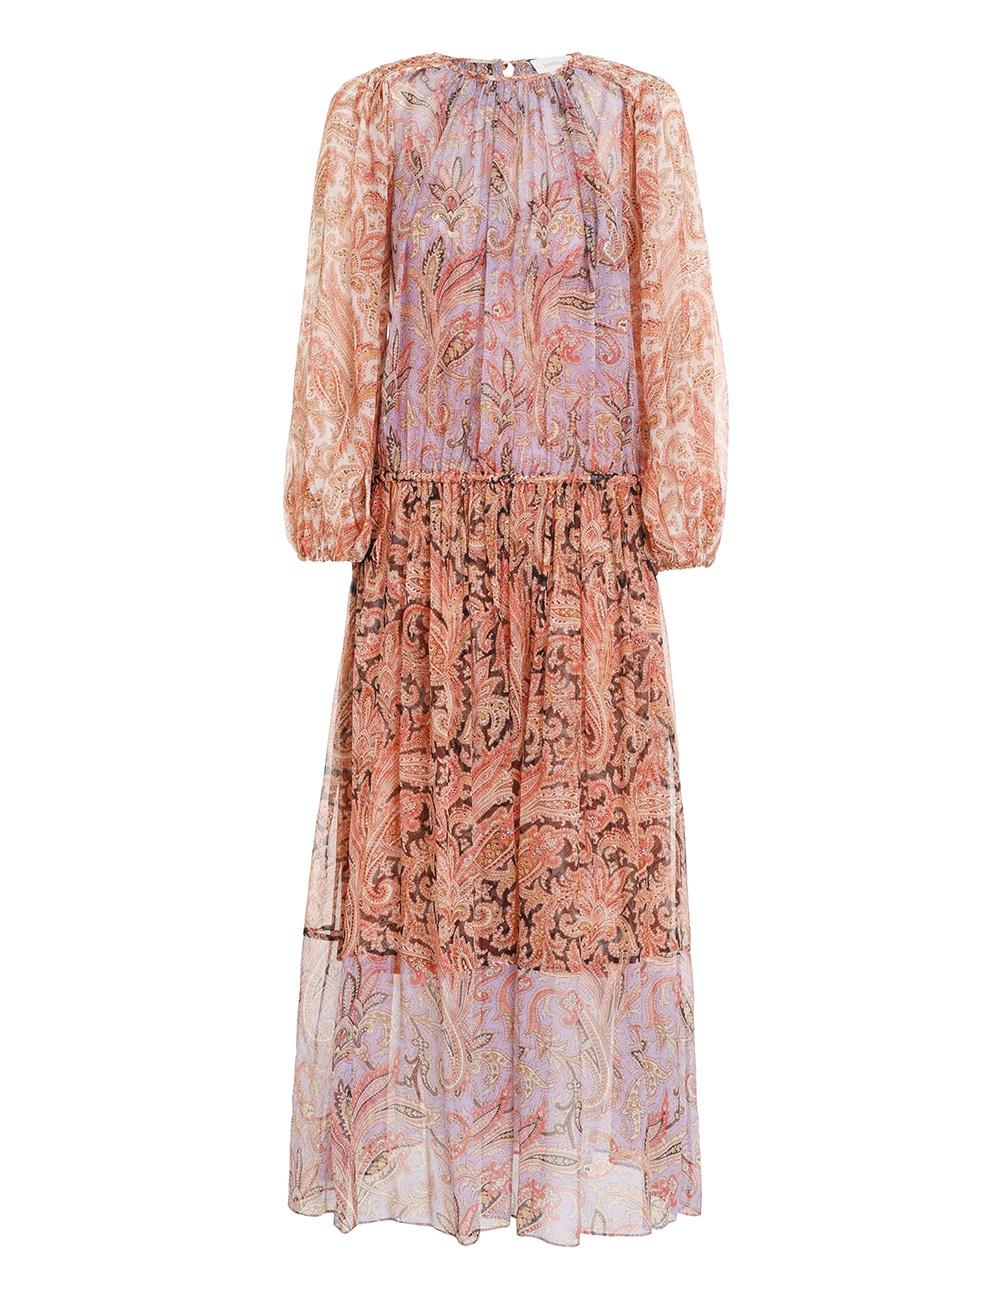 Botanica Rouched Maxi Dress